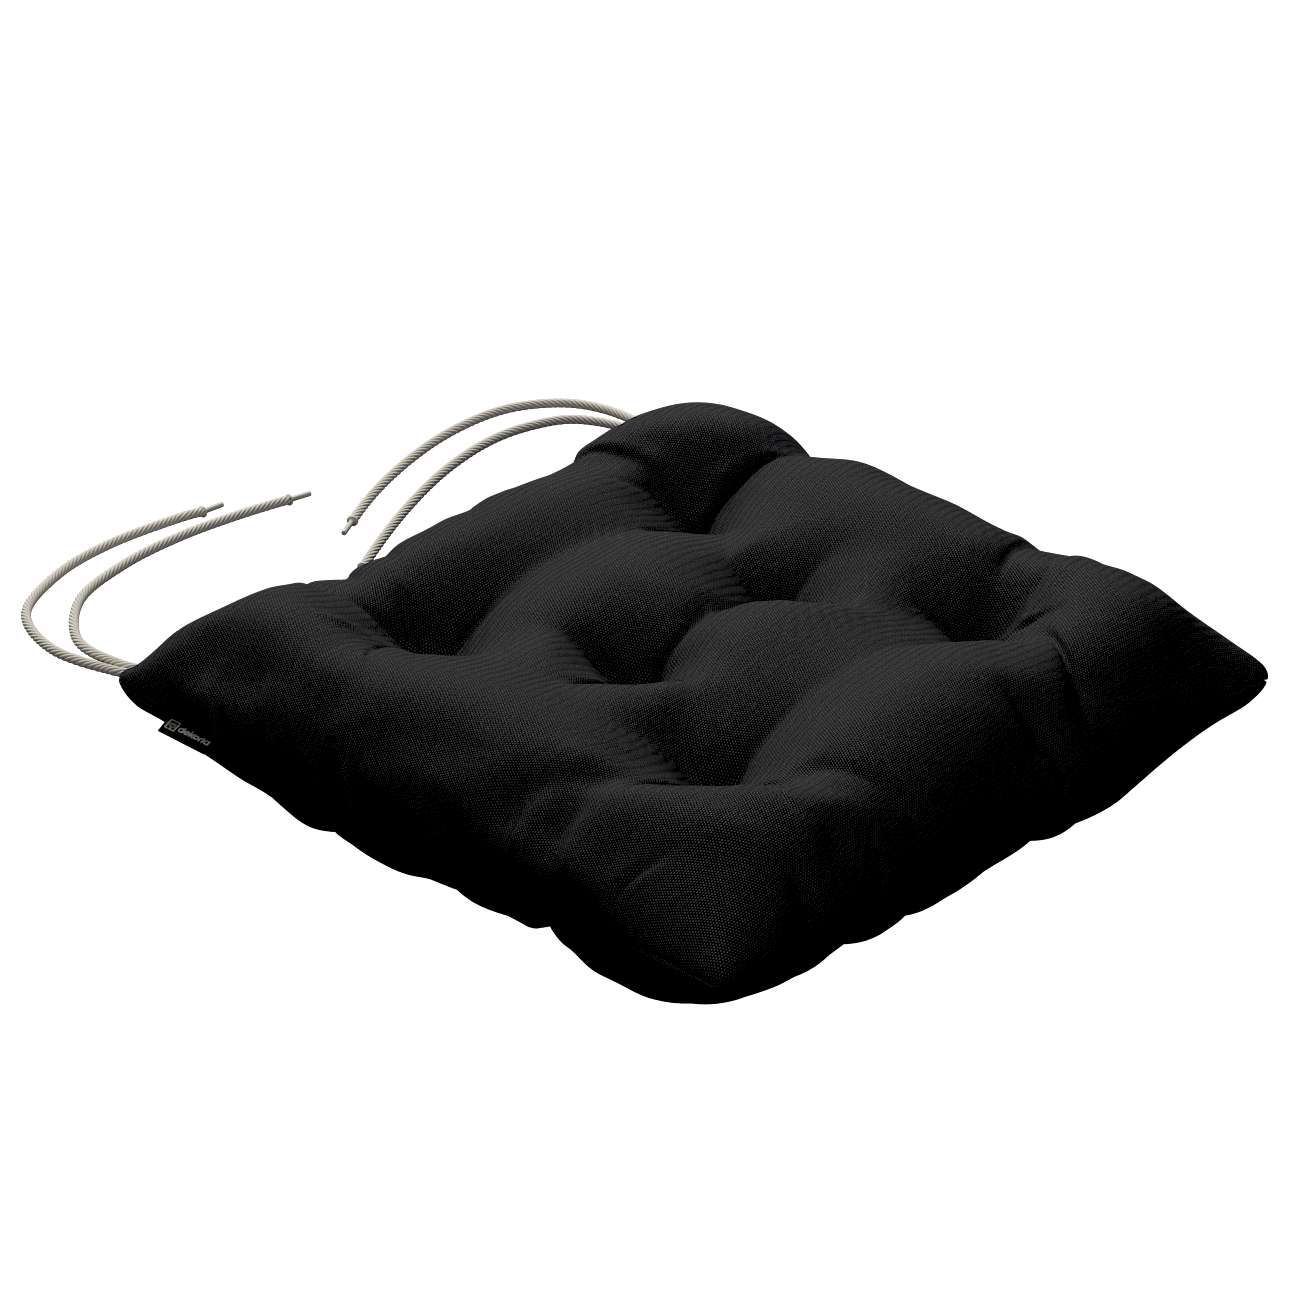 Kėdės pagalvėlė Jacek  40 x 40 x 8 cm kolekcijoje Etna , audinys: 705-00